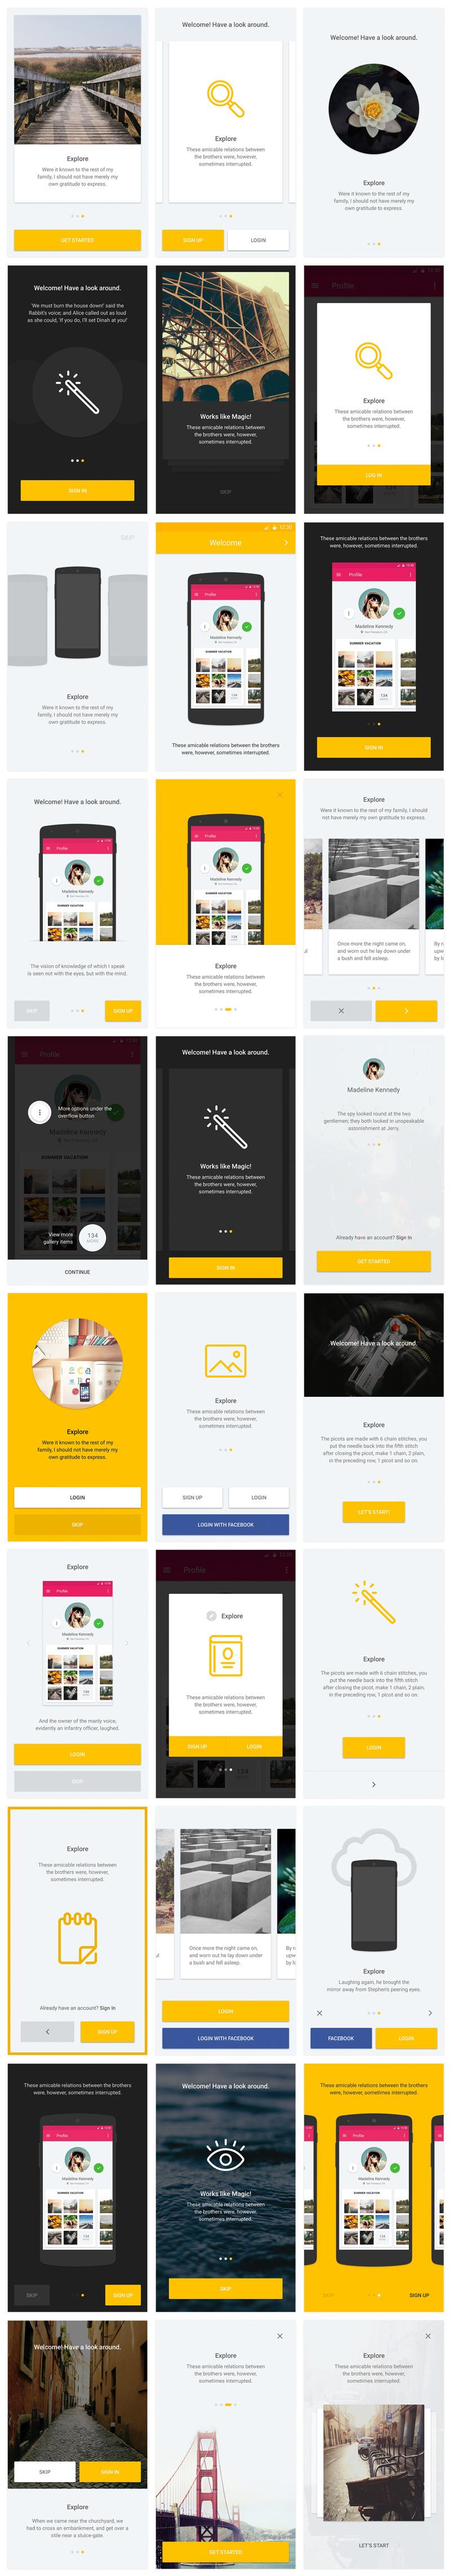 App网页UI设计模板designshidai_ui88